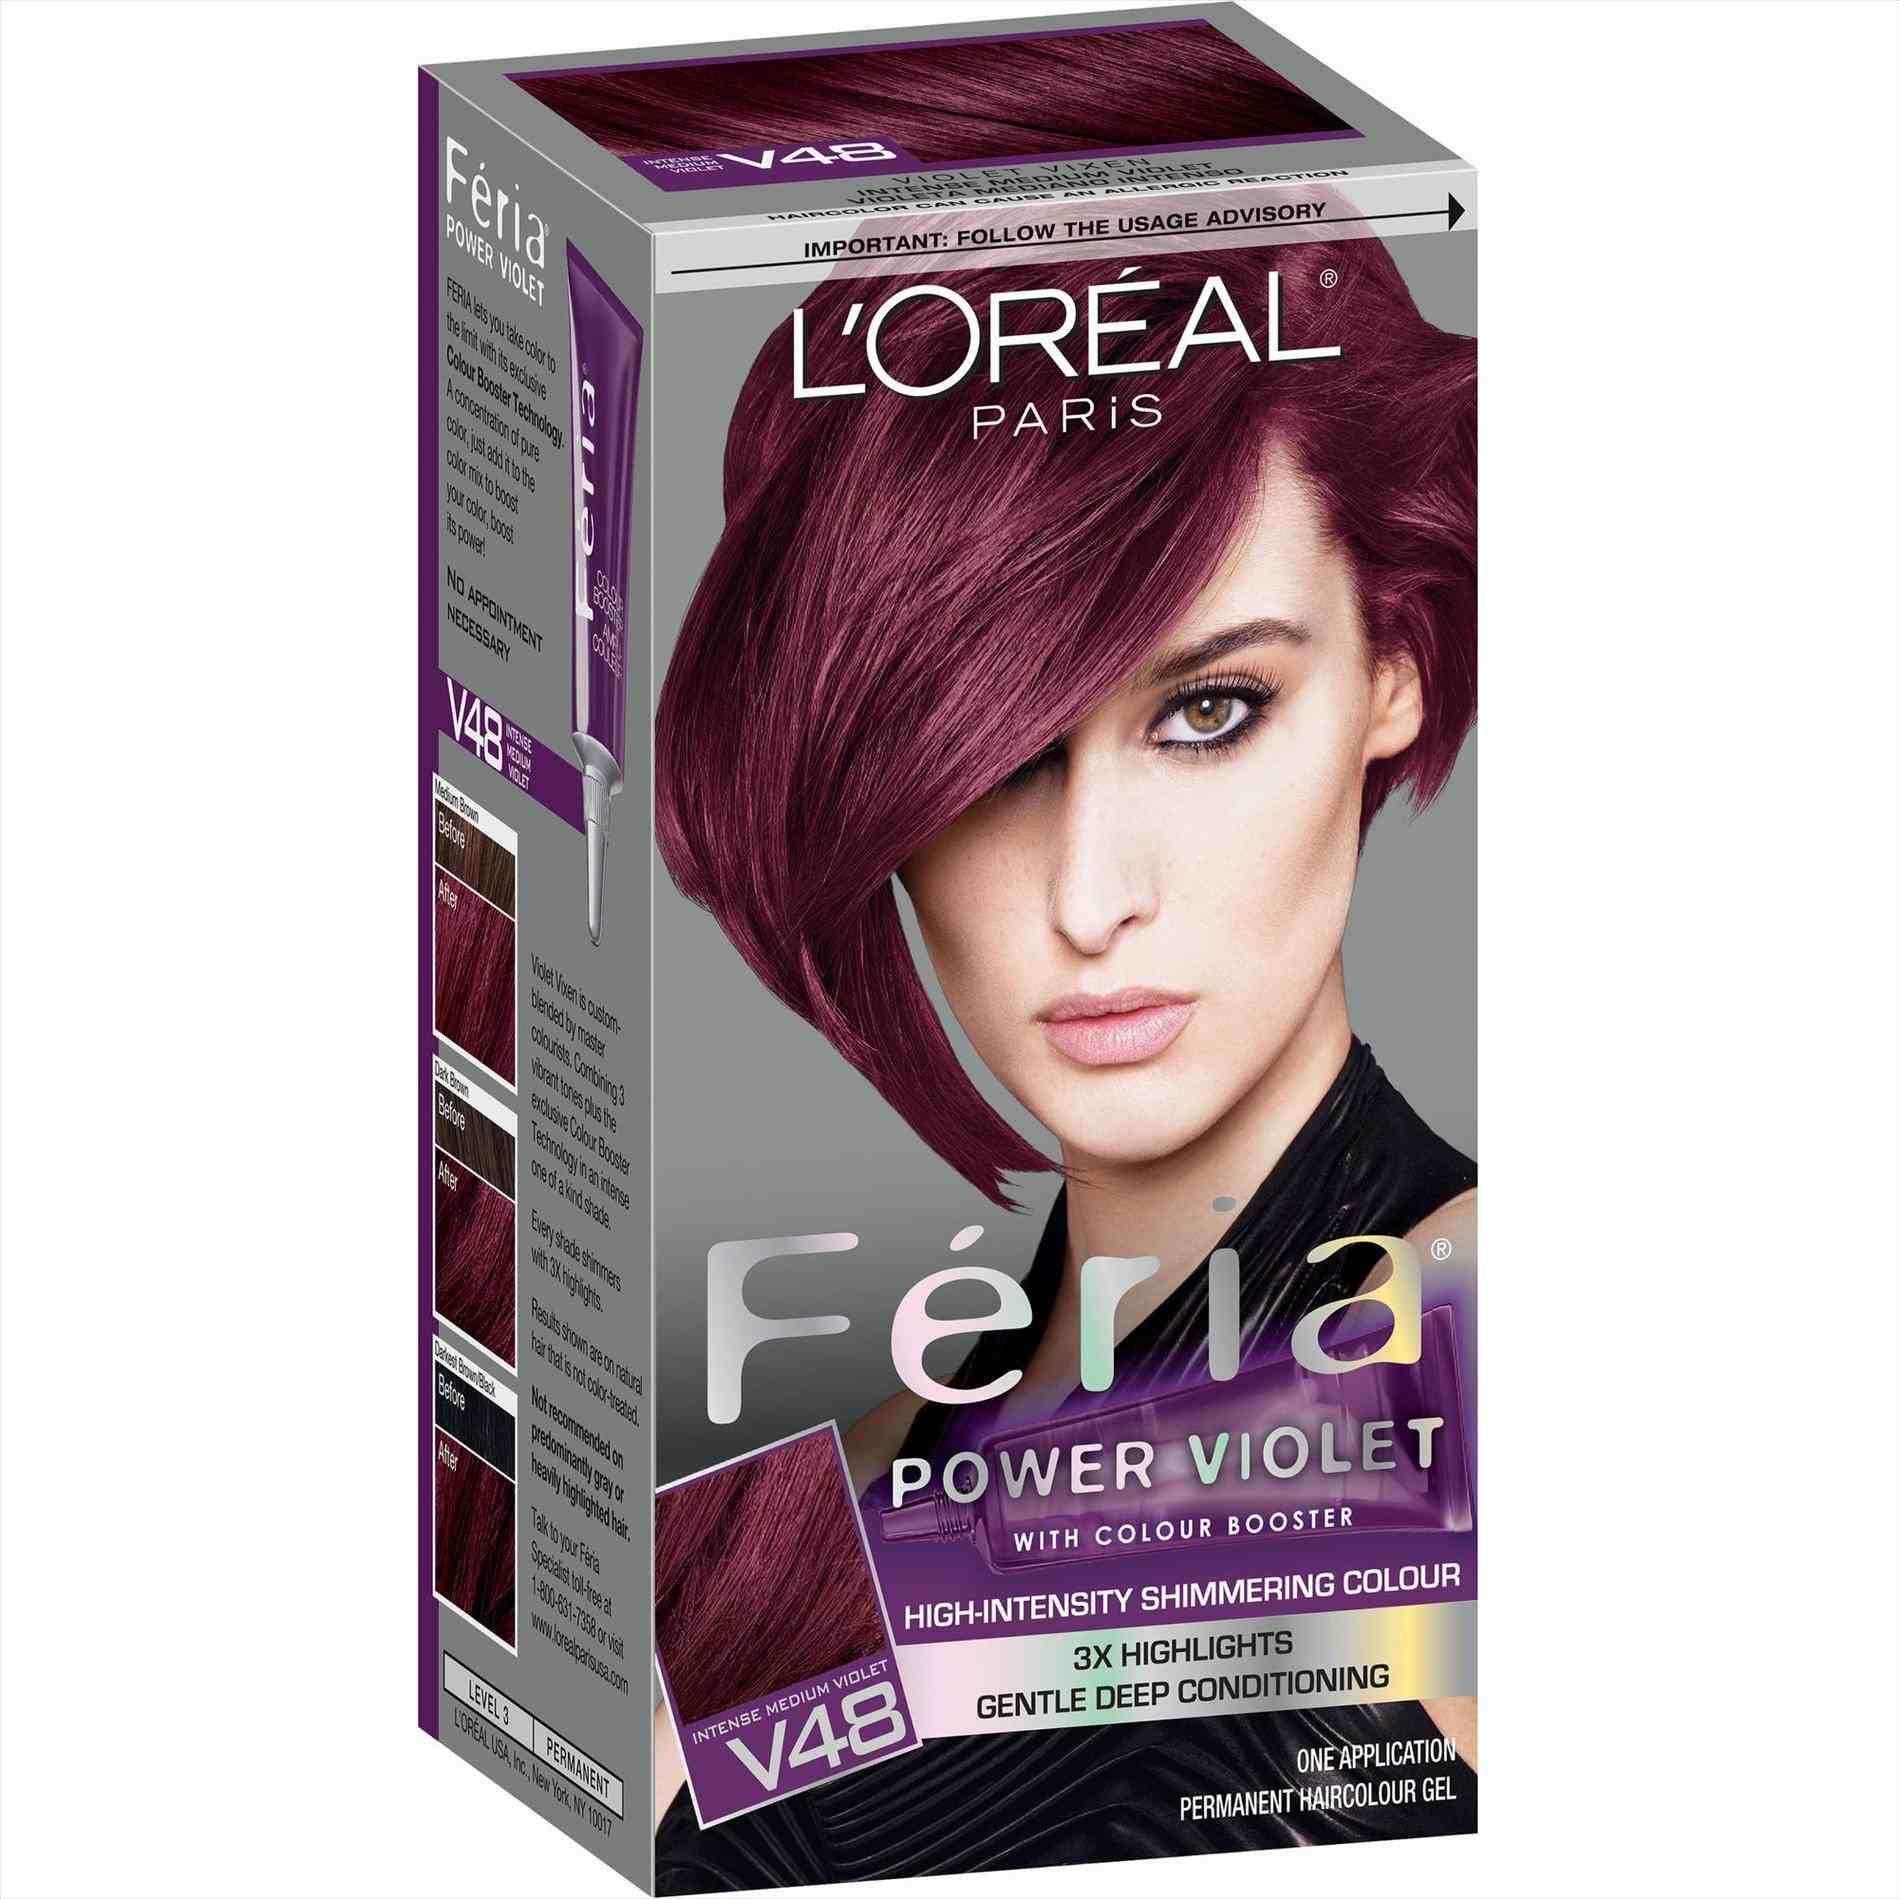 Aubergine Hair Color Loreal Drugstore Hair Color Hair Color